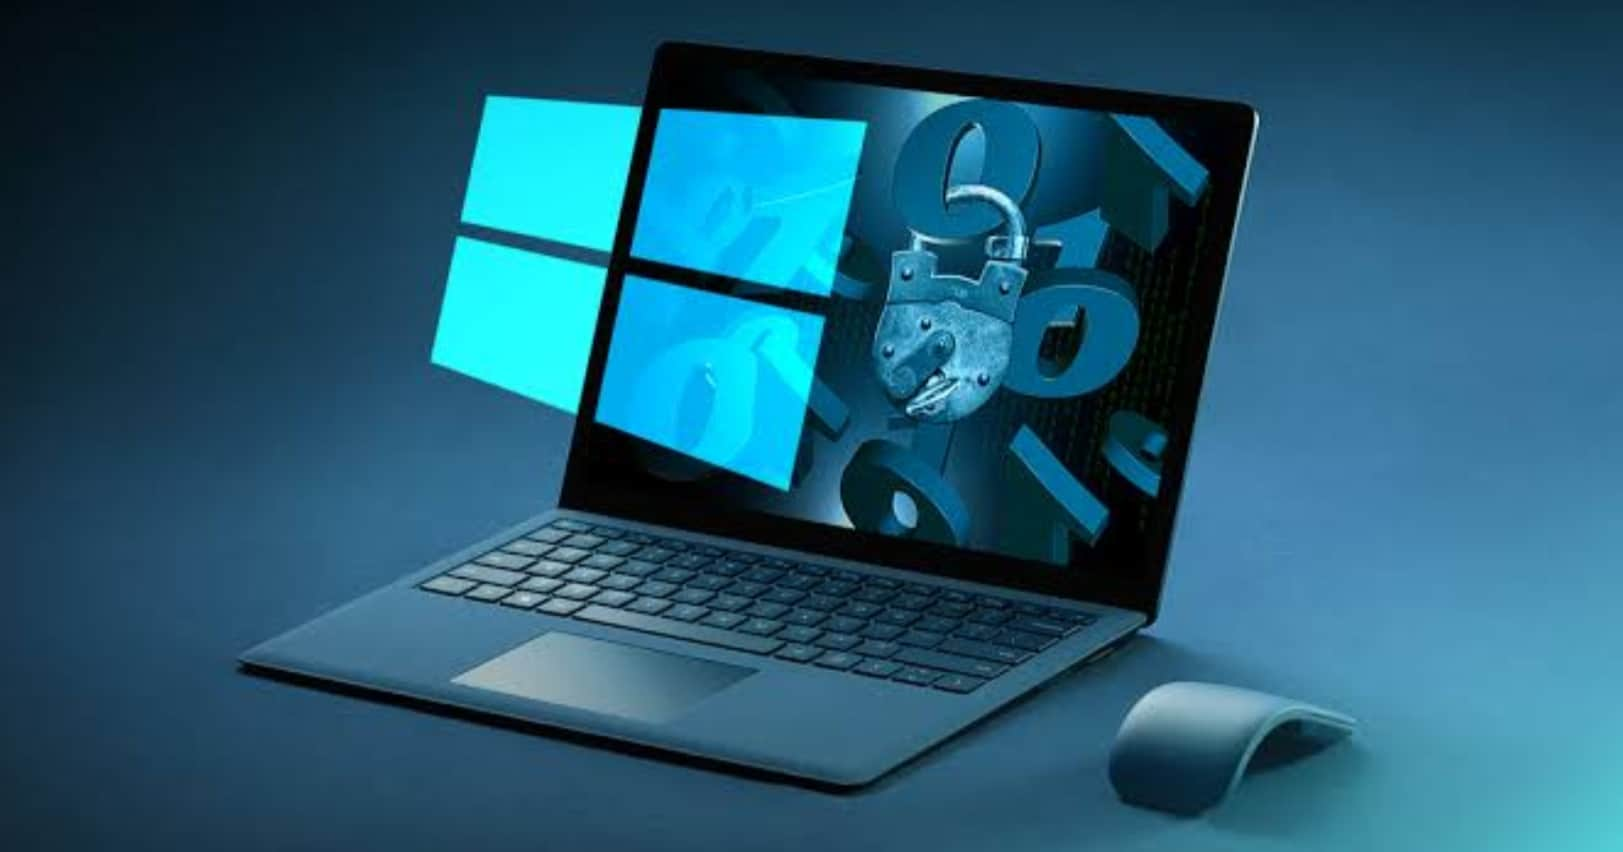 Microsoft Reportedly Preparing PCs for Windows 10 21H1